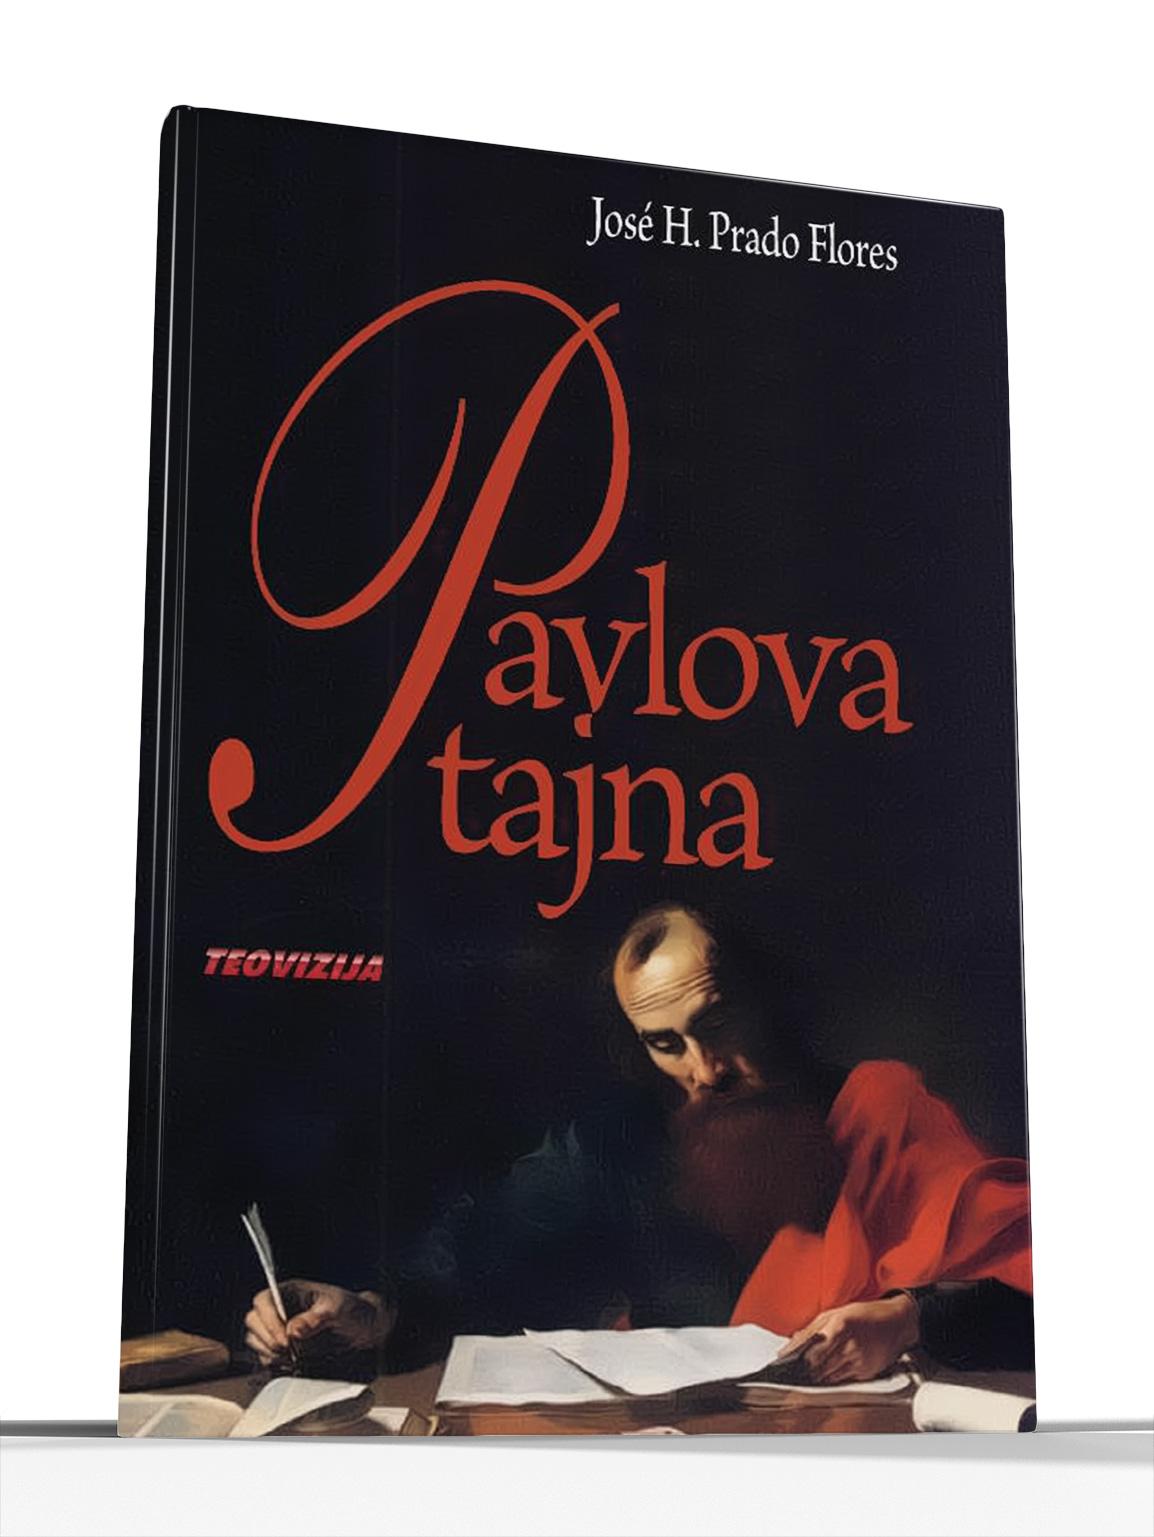 PAVLOVA TAJNA - José H. Prado Flores